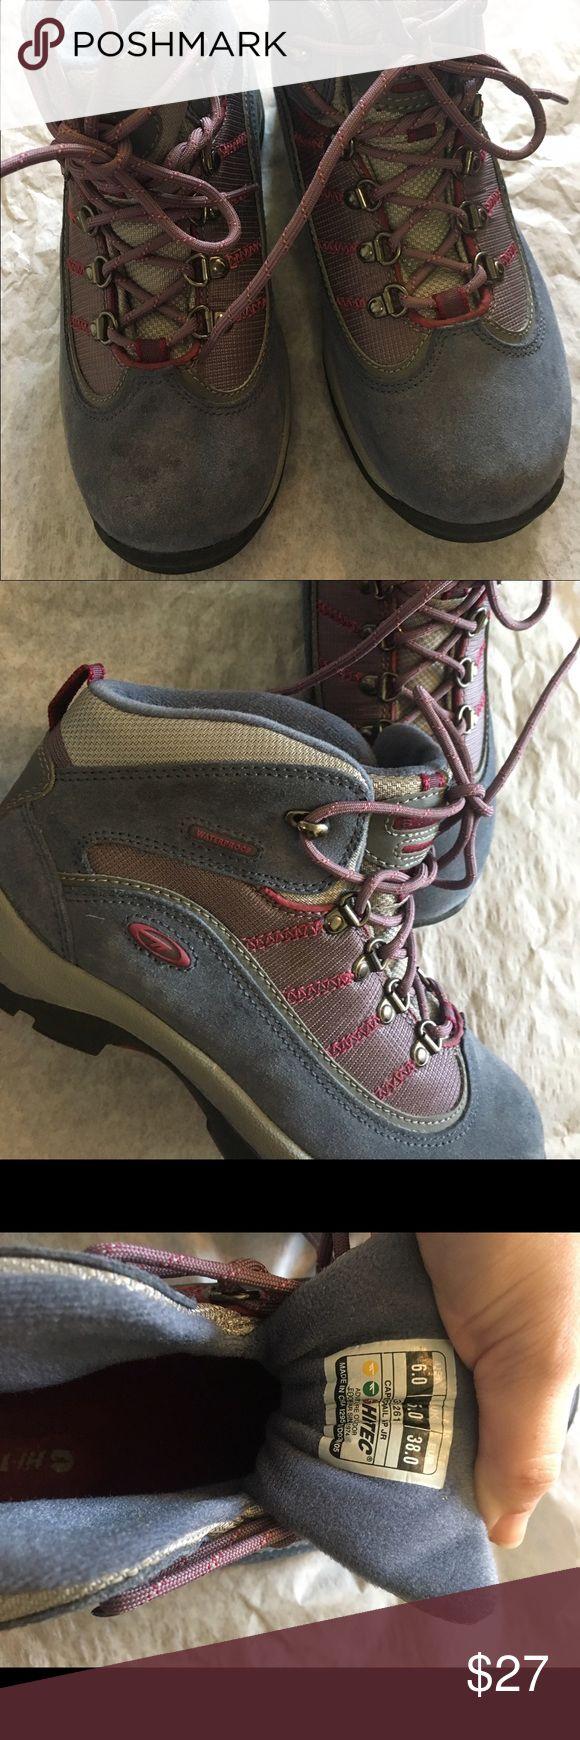 NWOT Hi-Tec Hiking Boots New without tags purple women's Hi-Tec Cape Trail hiking boots. Waterproof. Never worn. Women's size 6. Hi-Tec Shoes Winter & Rain Boots